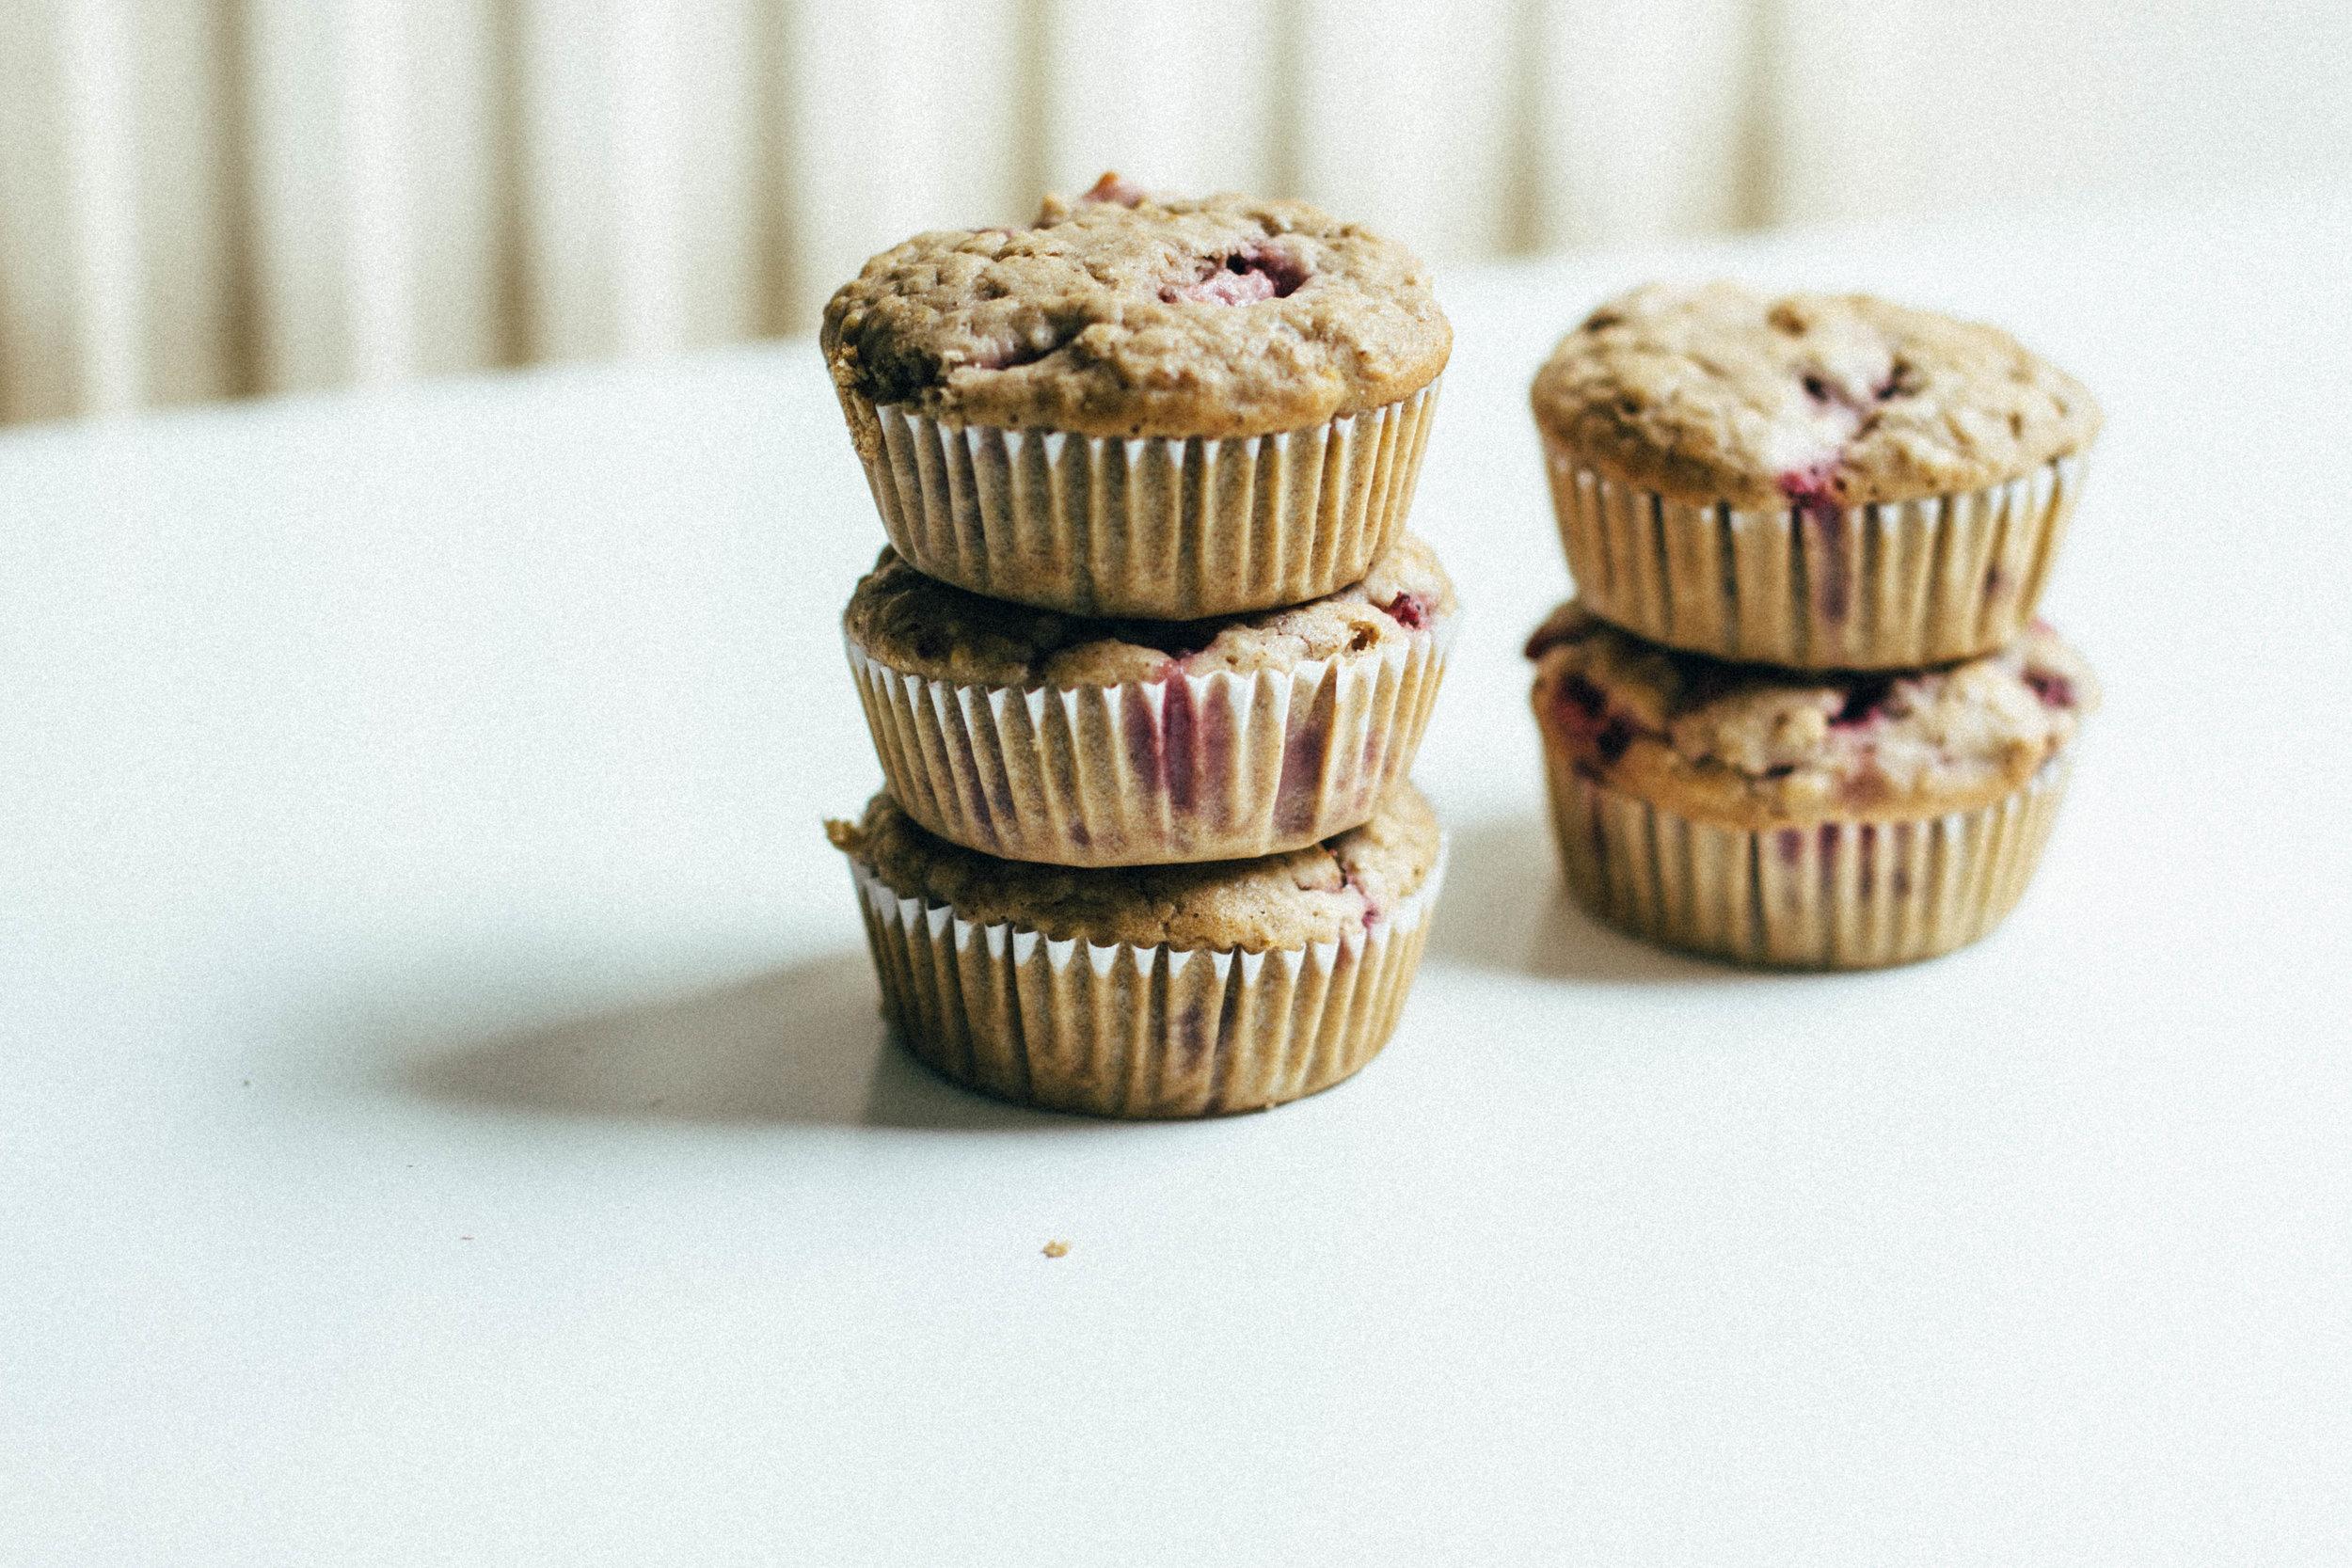 strawberry - oat muffins